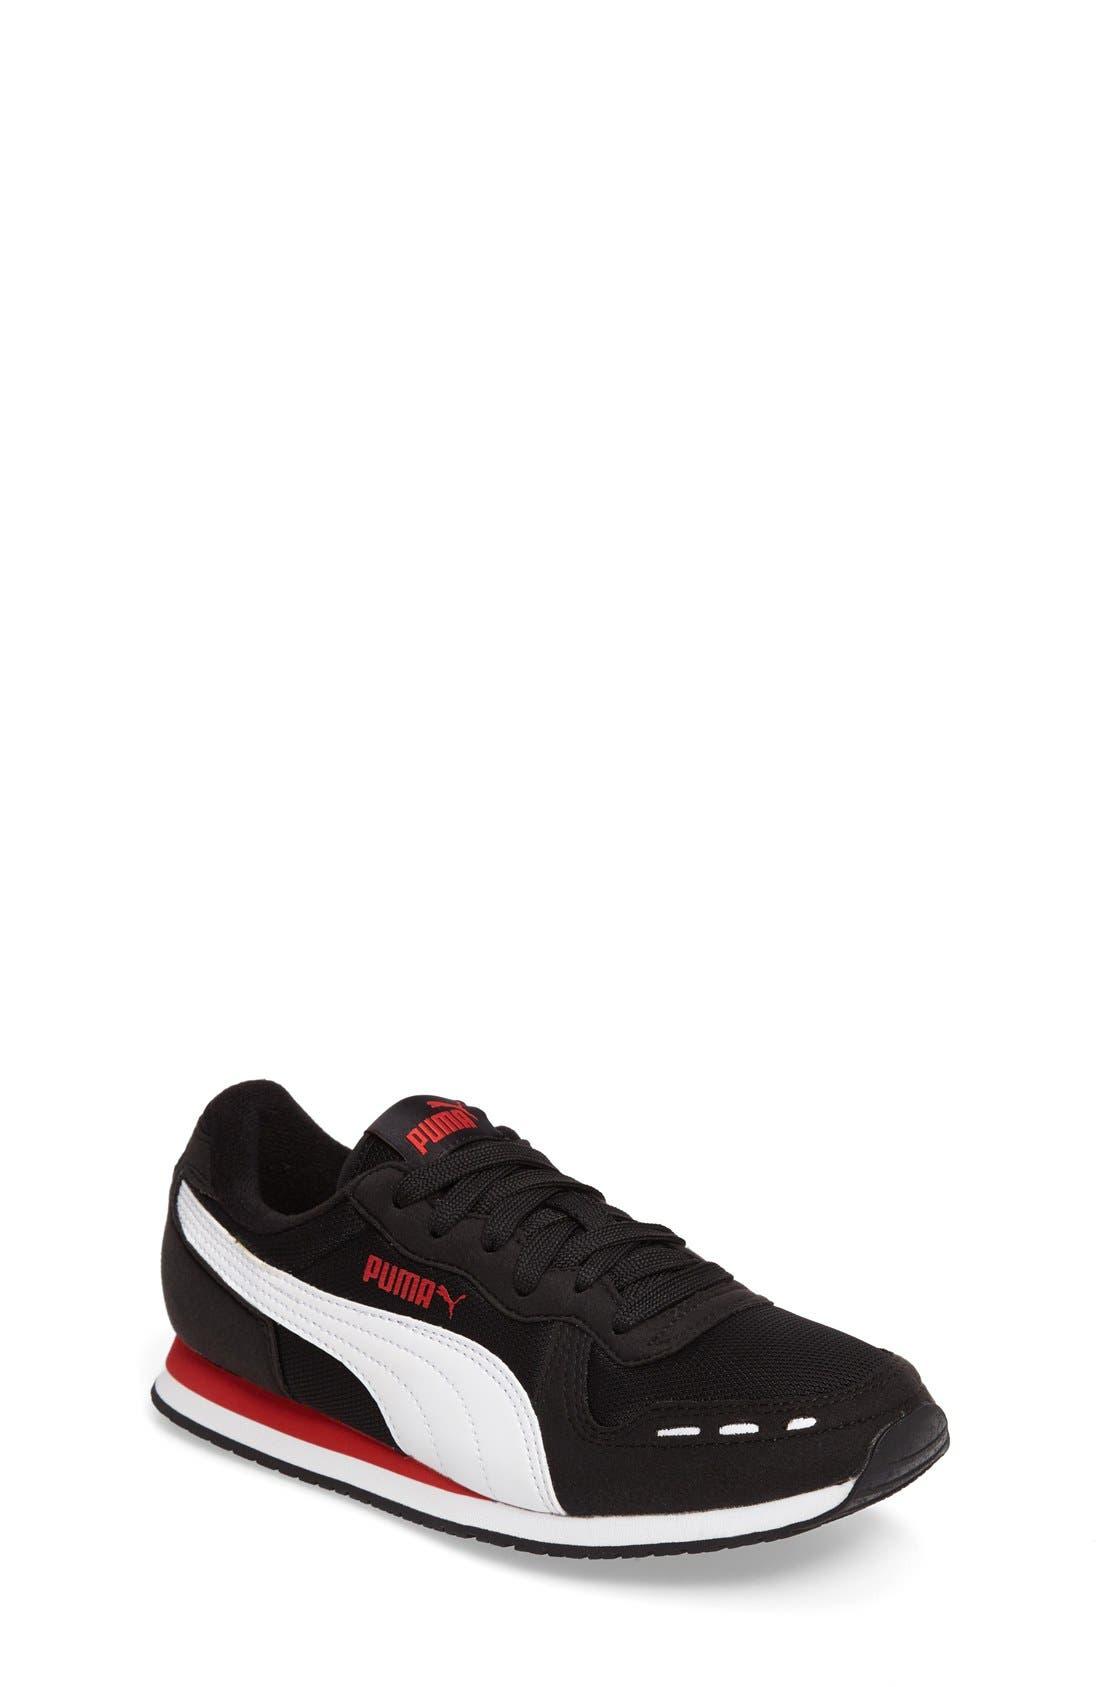 Cabana Racer Sneaker,                             Main thumbnail 1, color,                             001